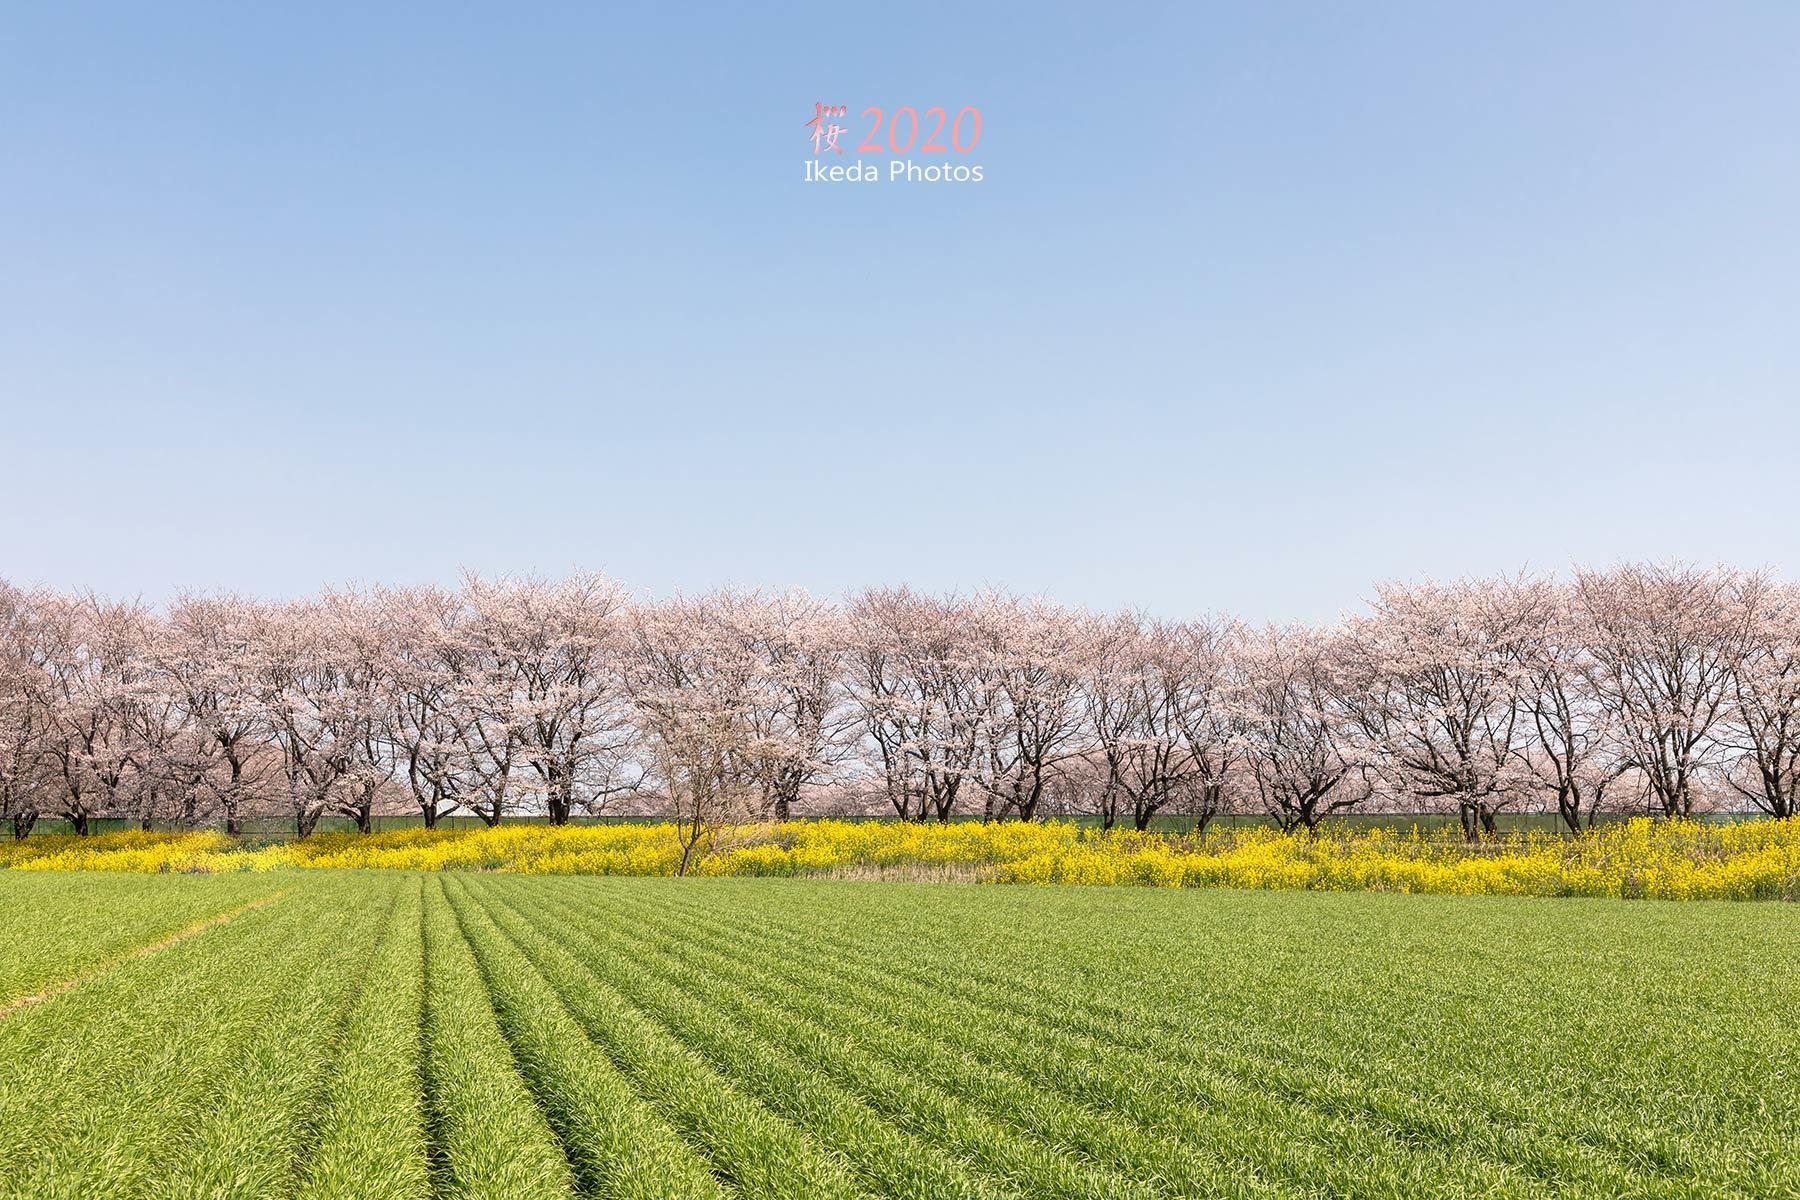 桜の季節_f0308134_14004475.jpg